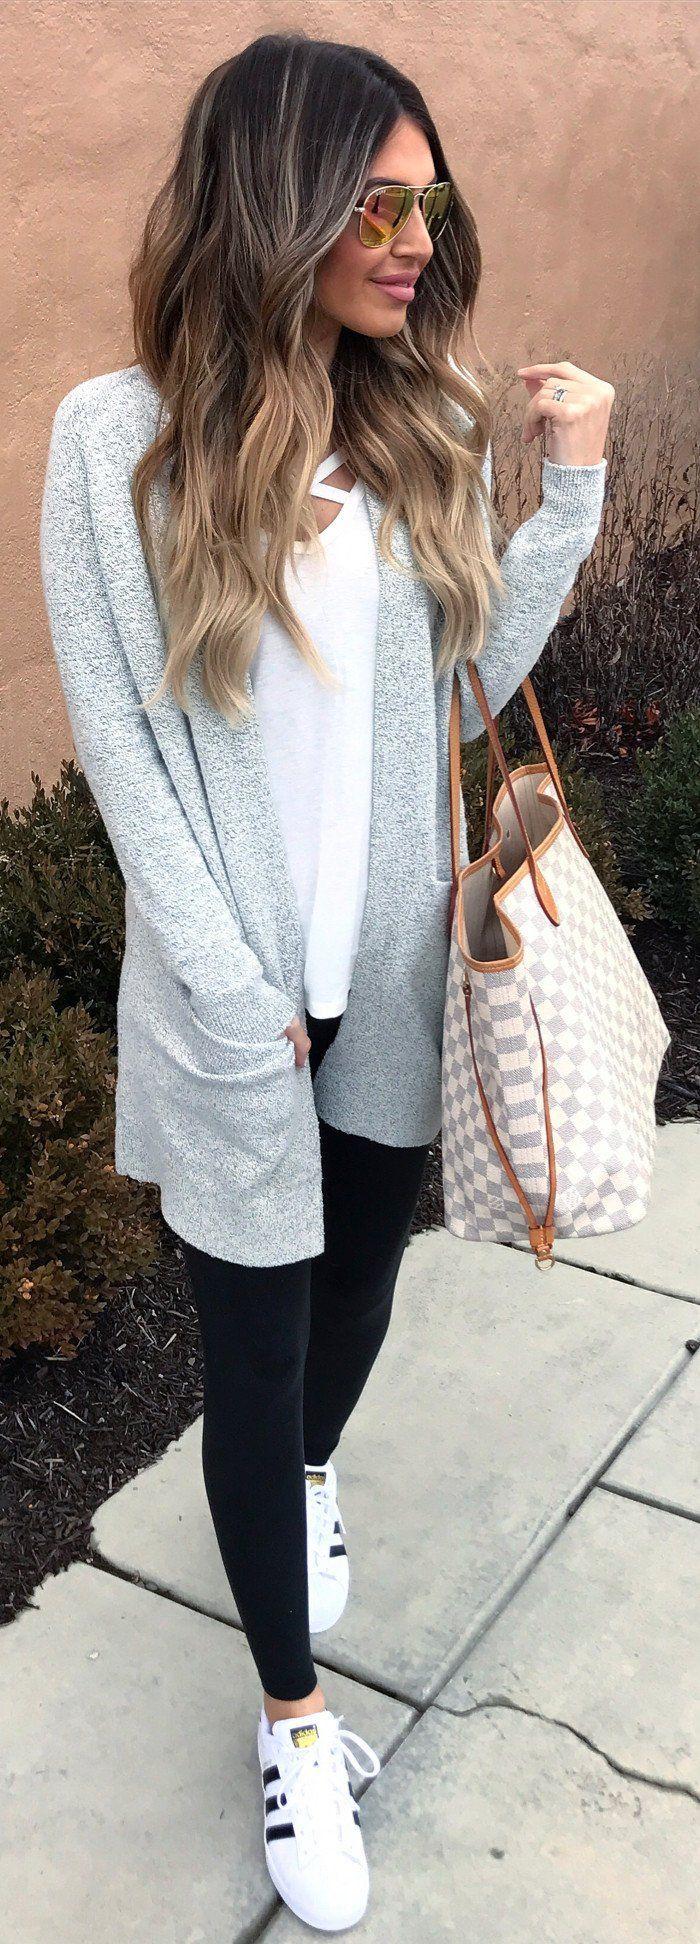 #winter #fashion /  Grey Cardigan / White Tee / Black Leggings / White Sneakers  / Checked Tote Bag